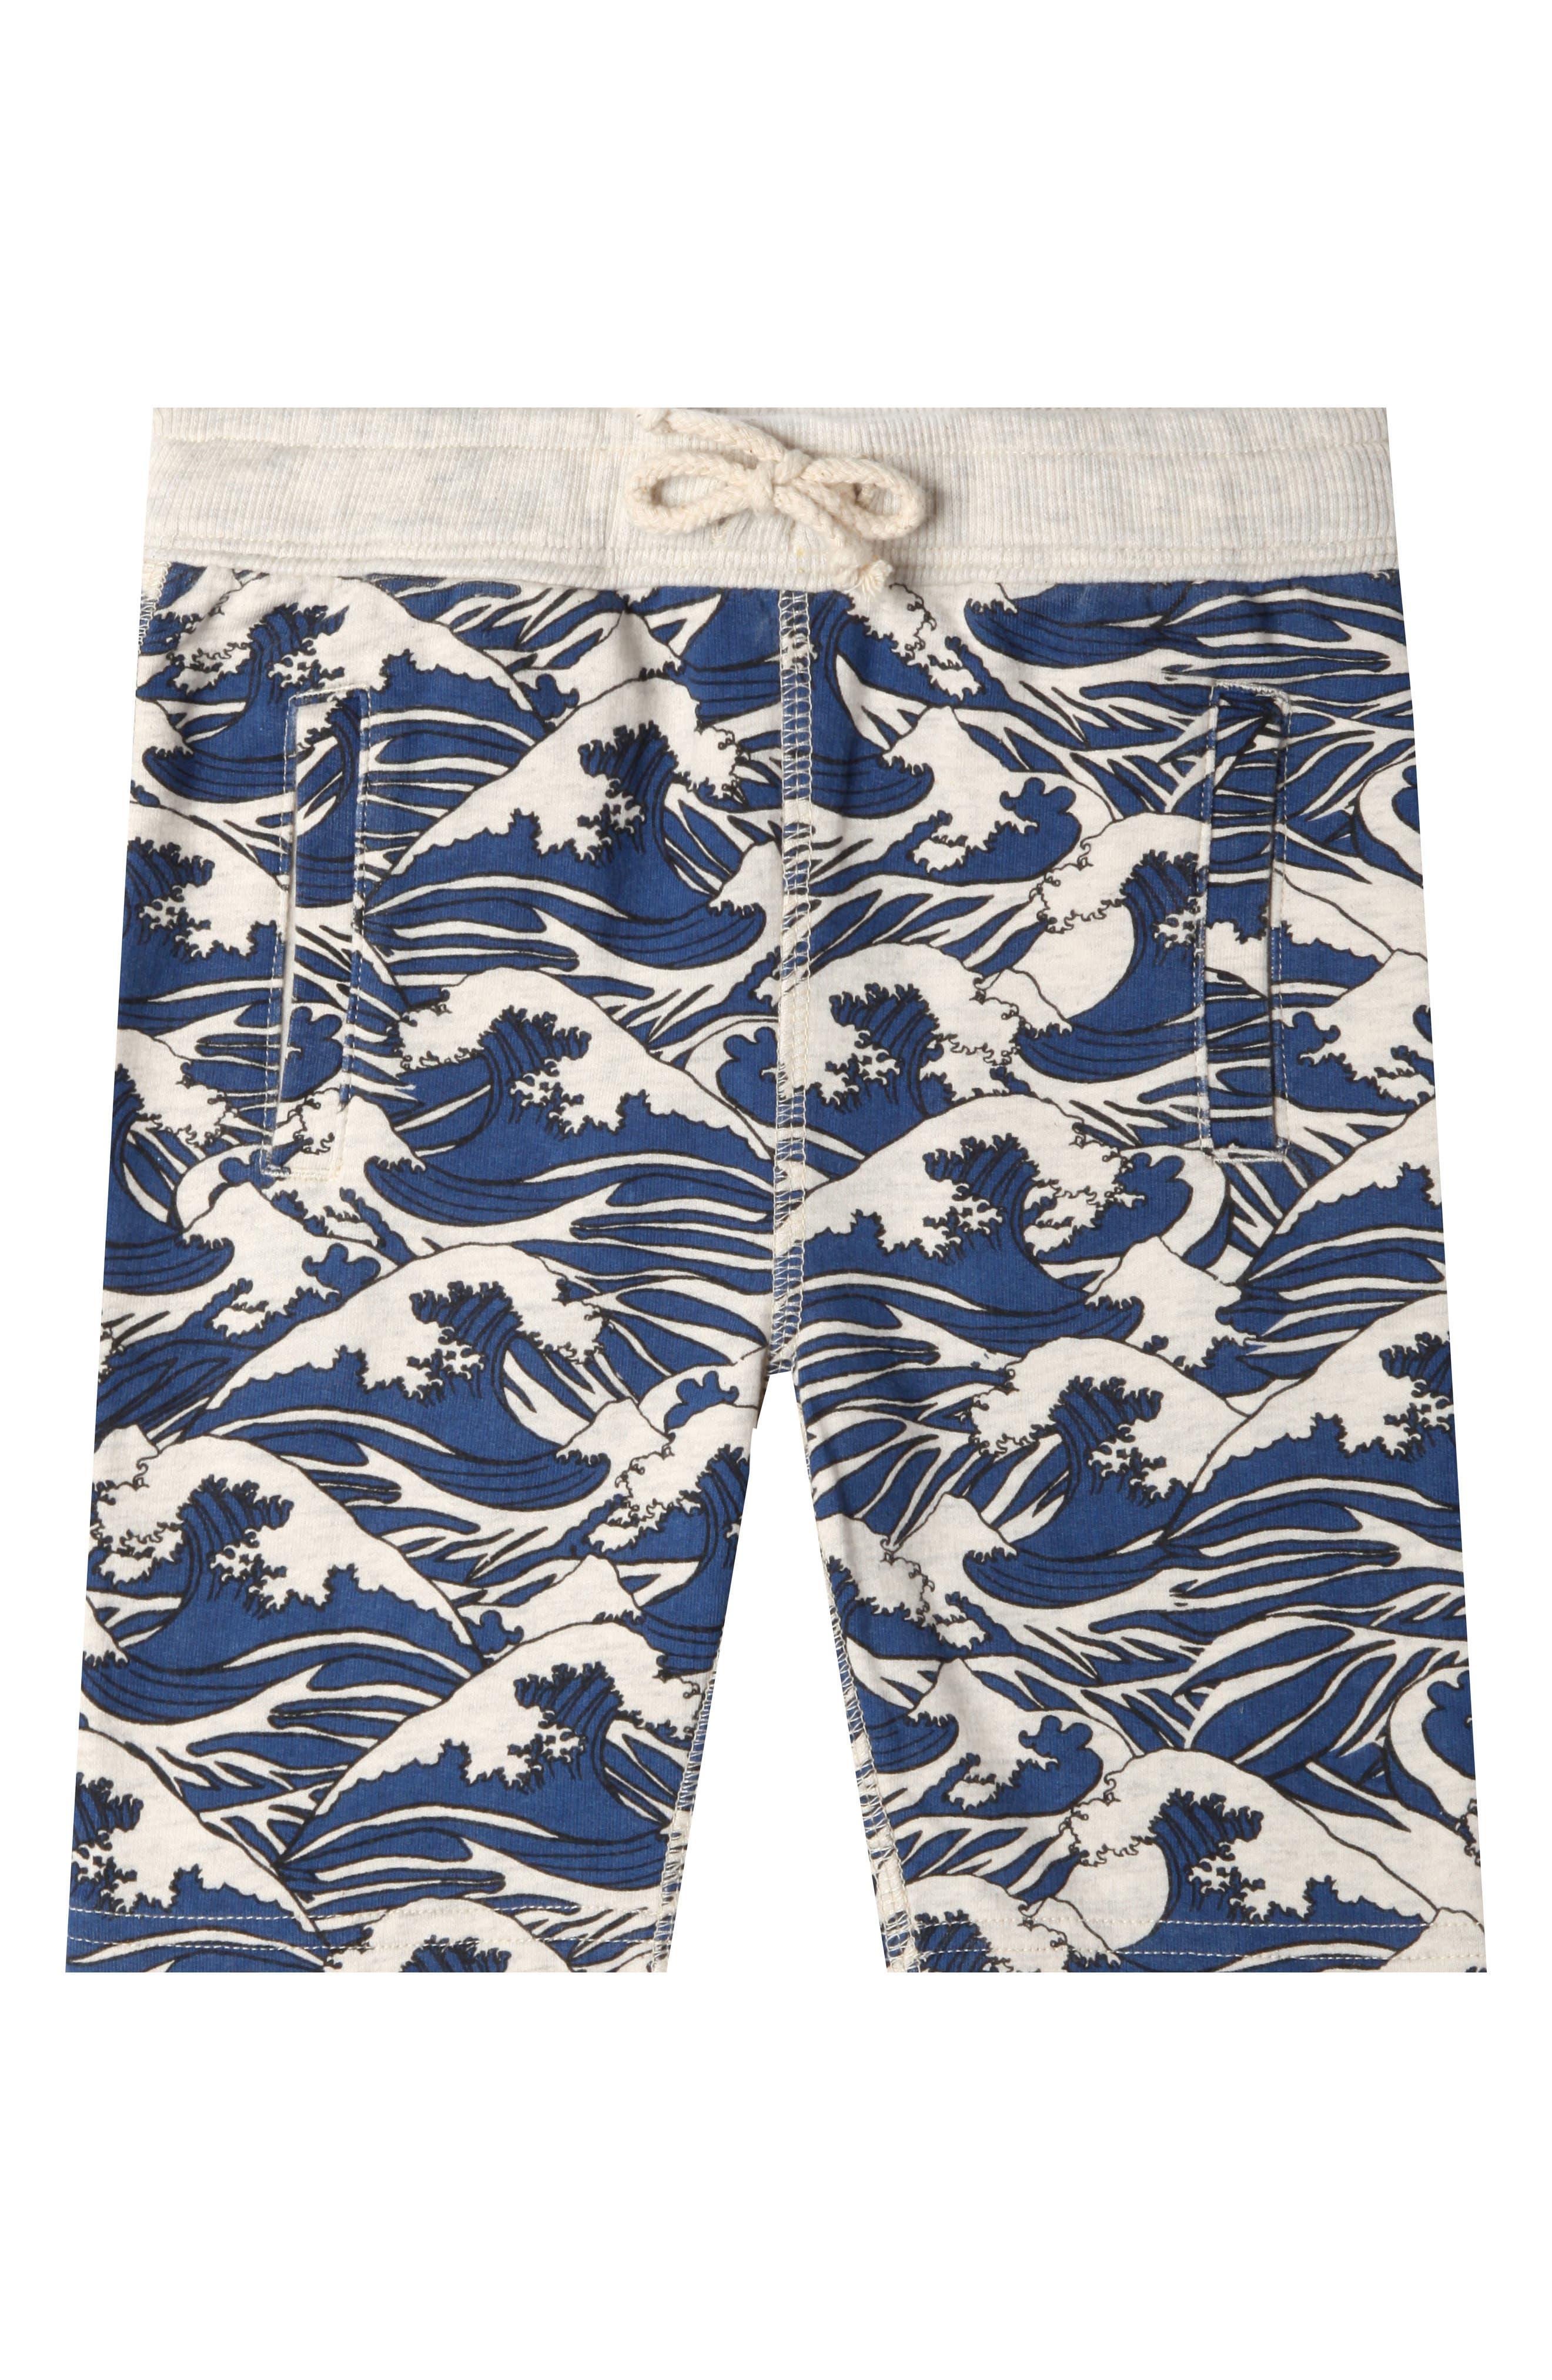 Lucas Waves Organic Cotton Shorts,                             Main thumbnail 1, color,                             OATMEAL HEATHER